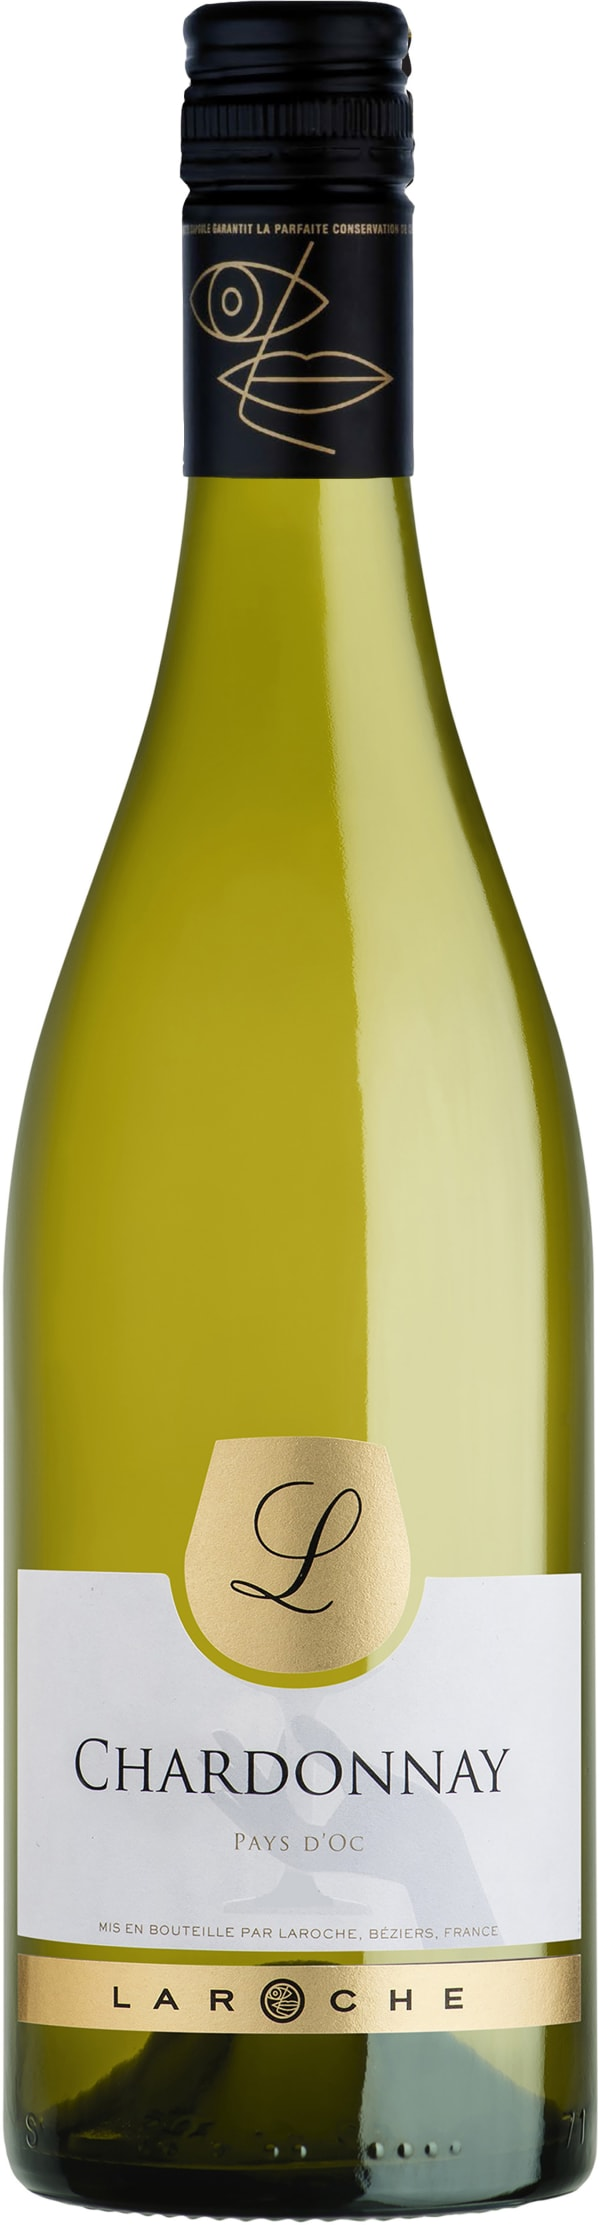 Laroche Chardonnay L 2020